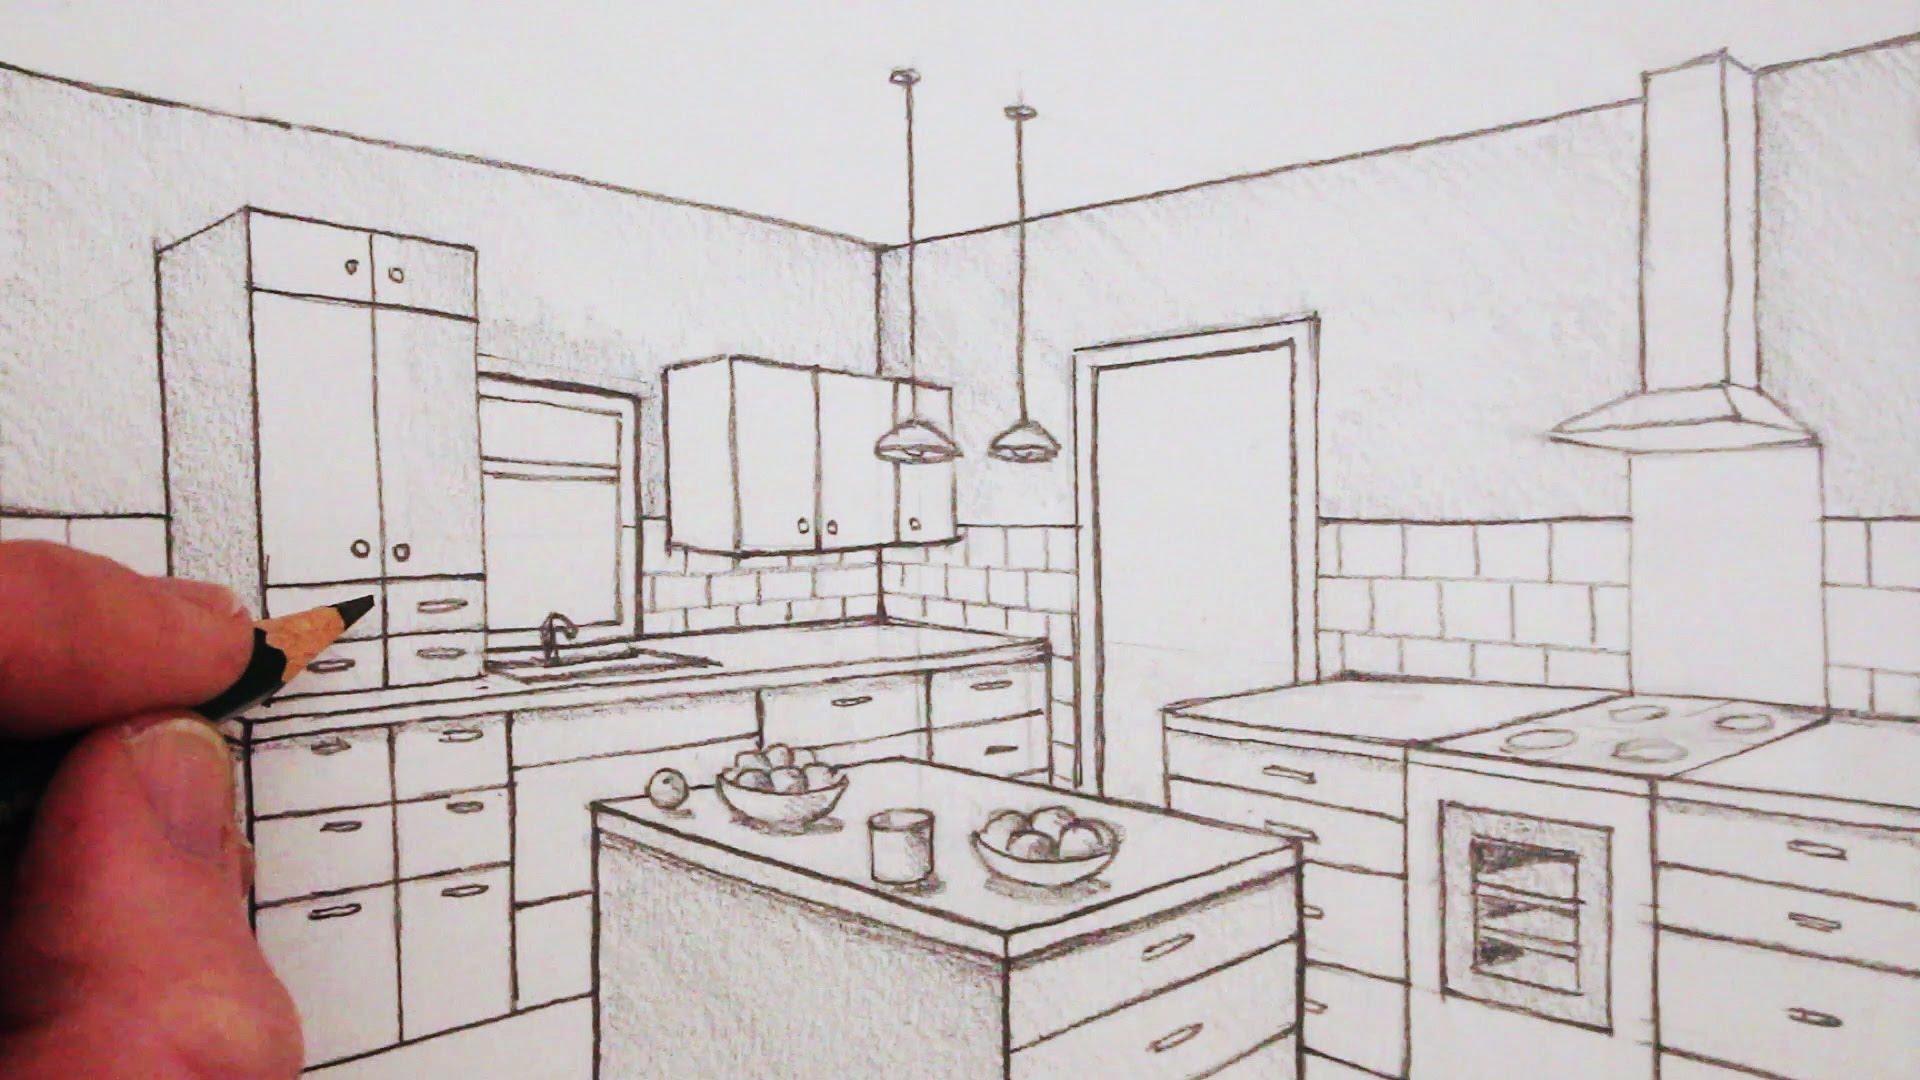 Interior Perspective Drawing At Getdrawings